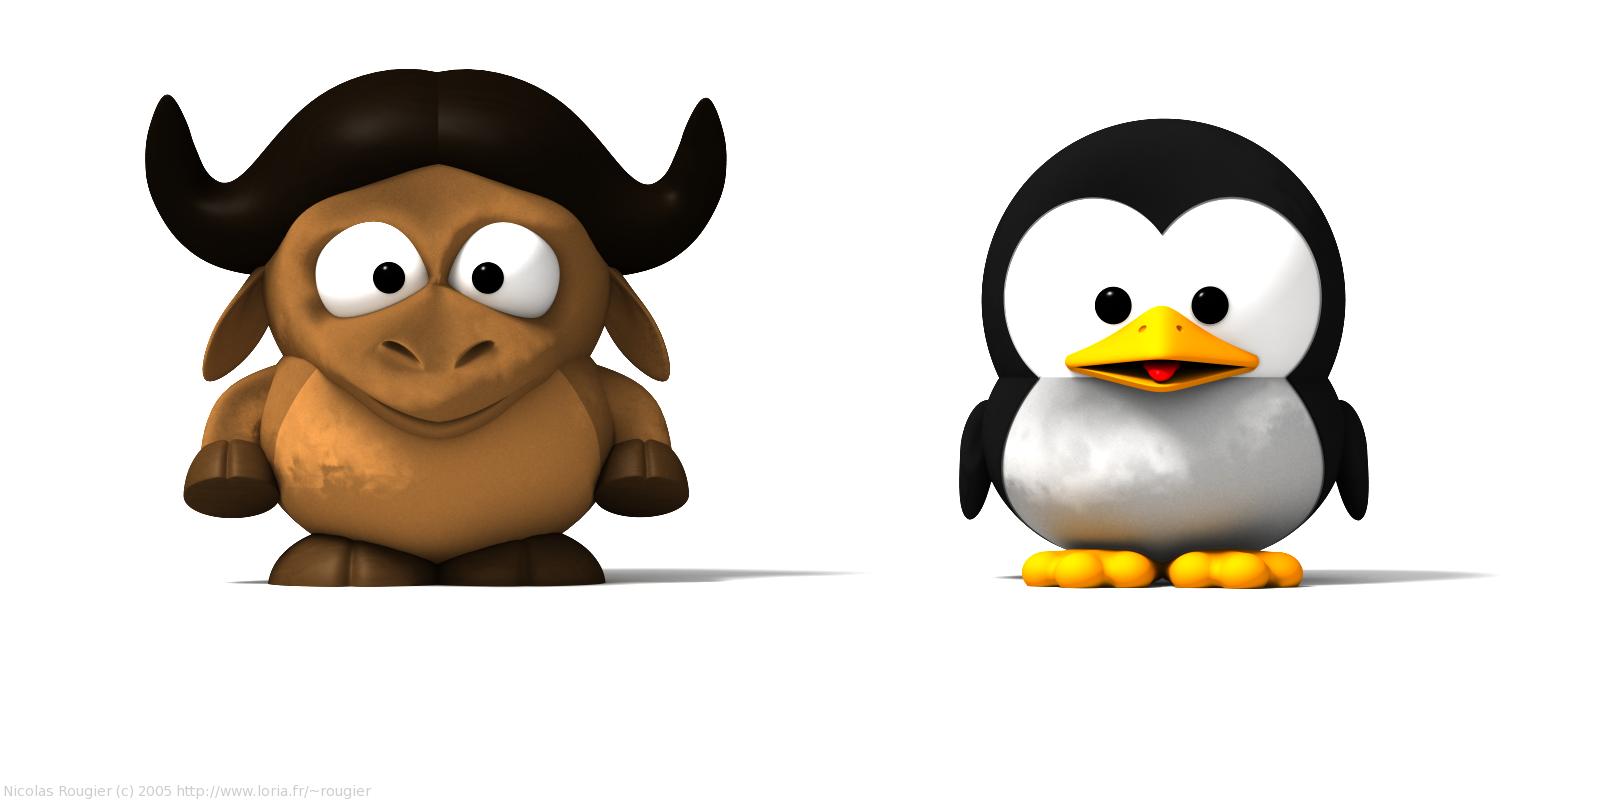 gnu project: